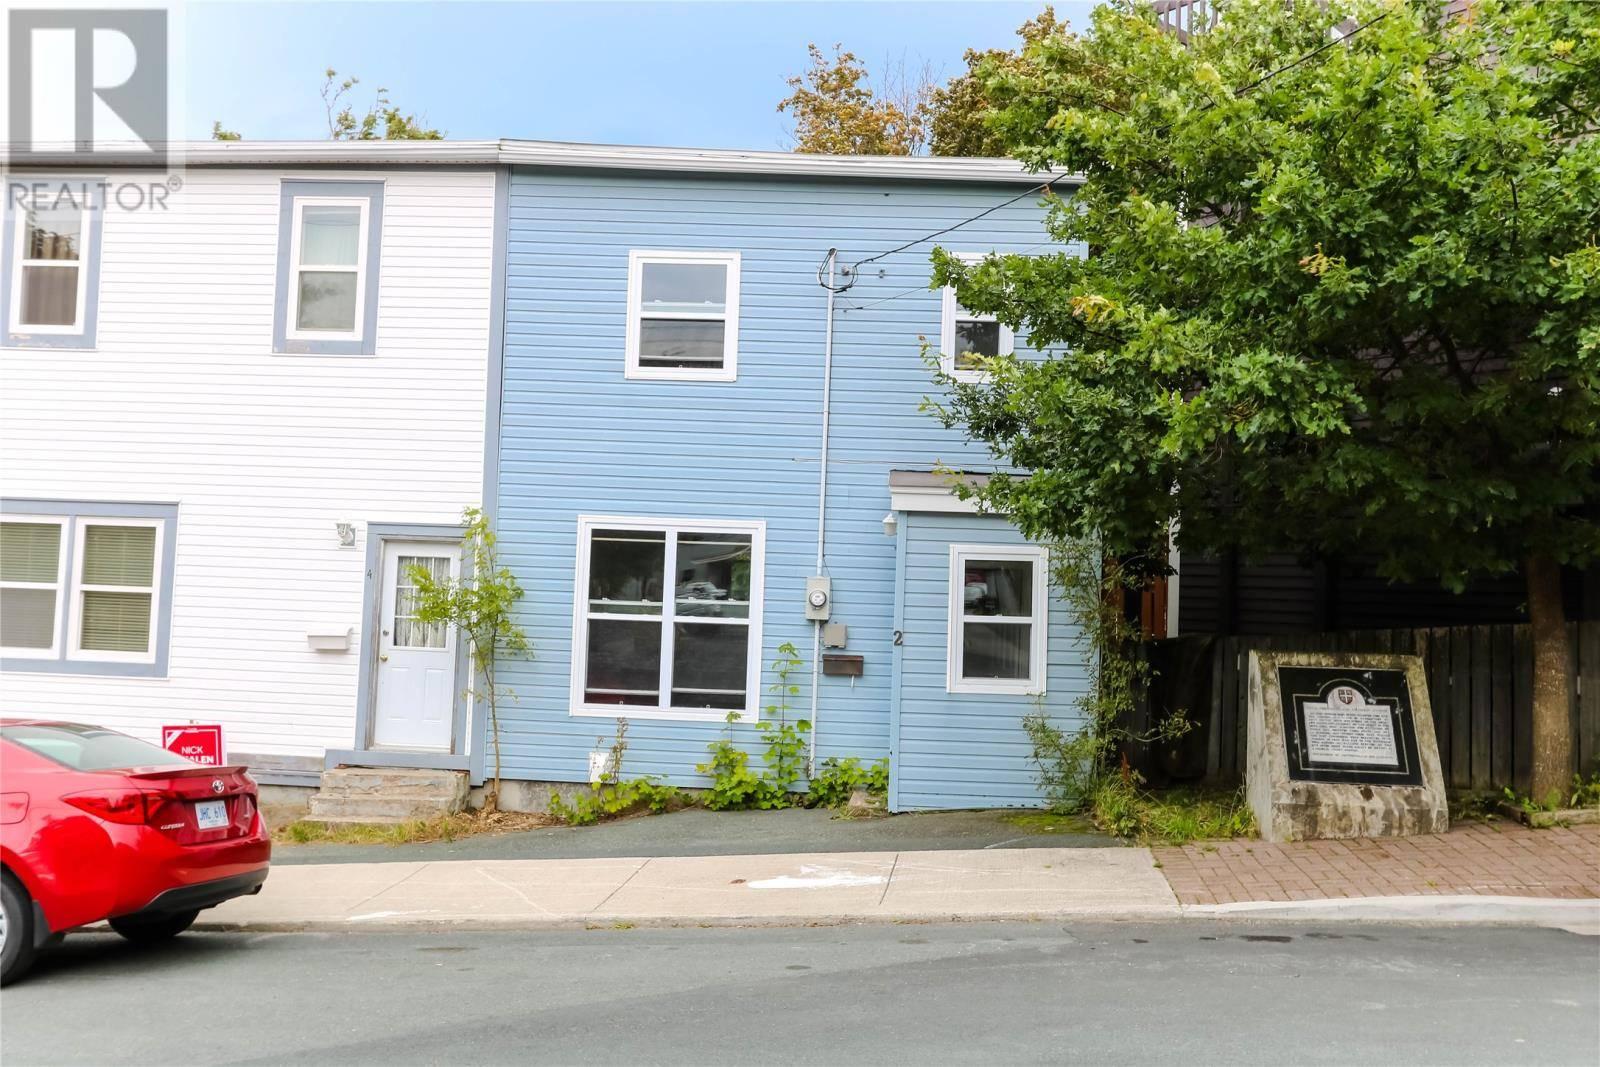 House for sale at 2 Belvedere St St. John's Newfoundland - MLS: 1209486